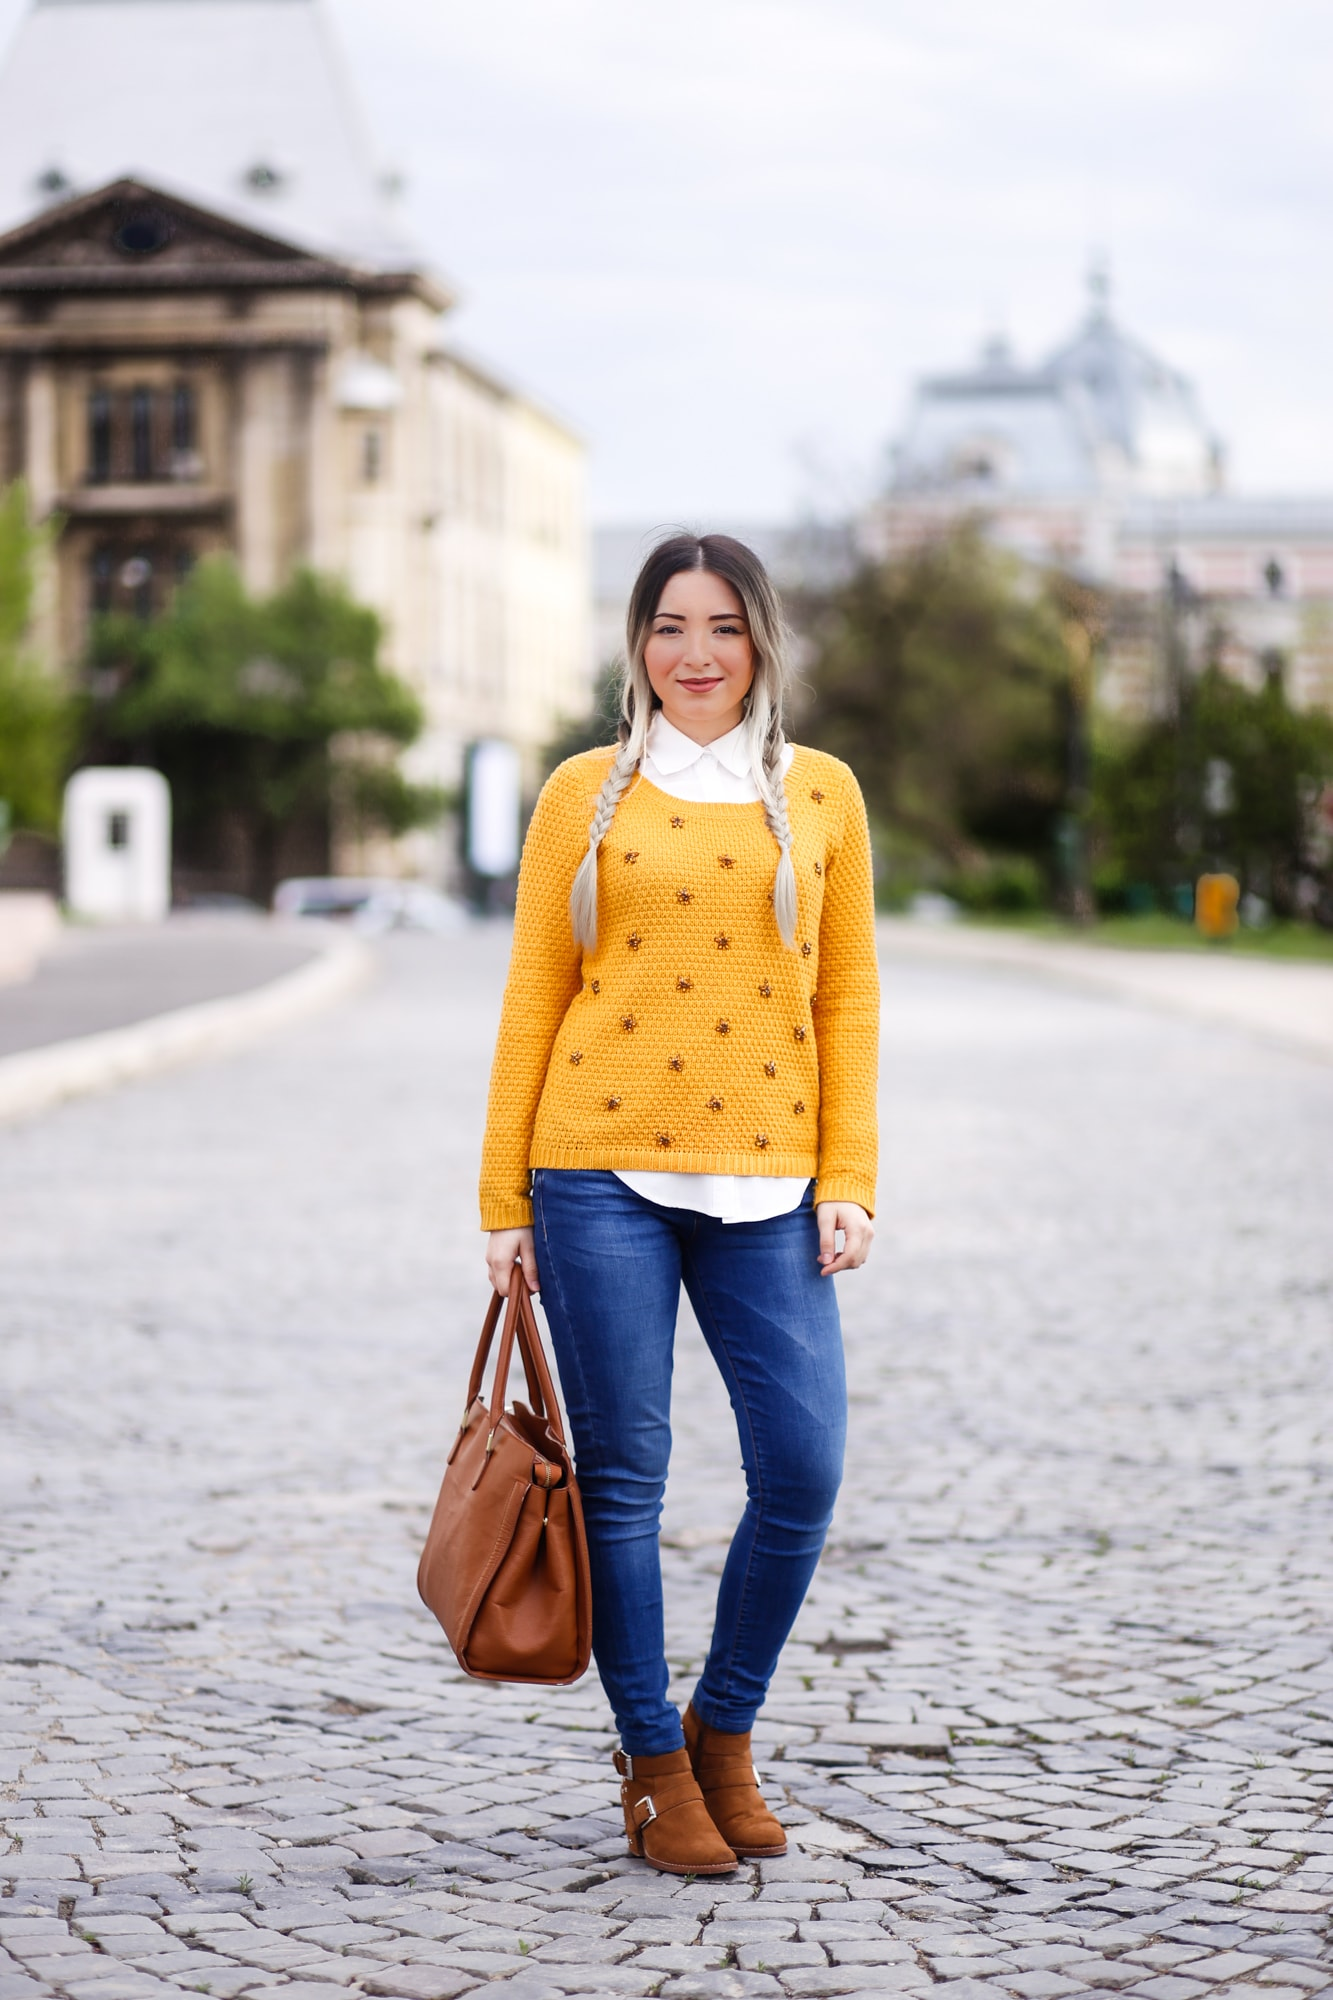 andreea ristea blog - fashion blogger bucuresti